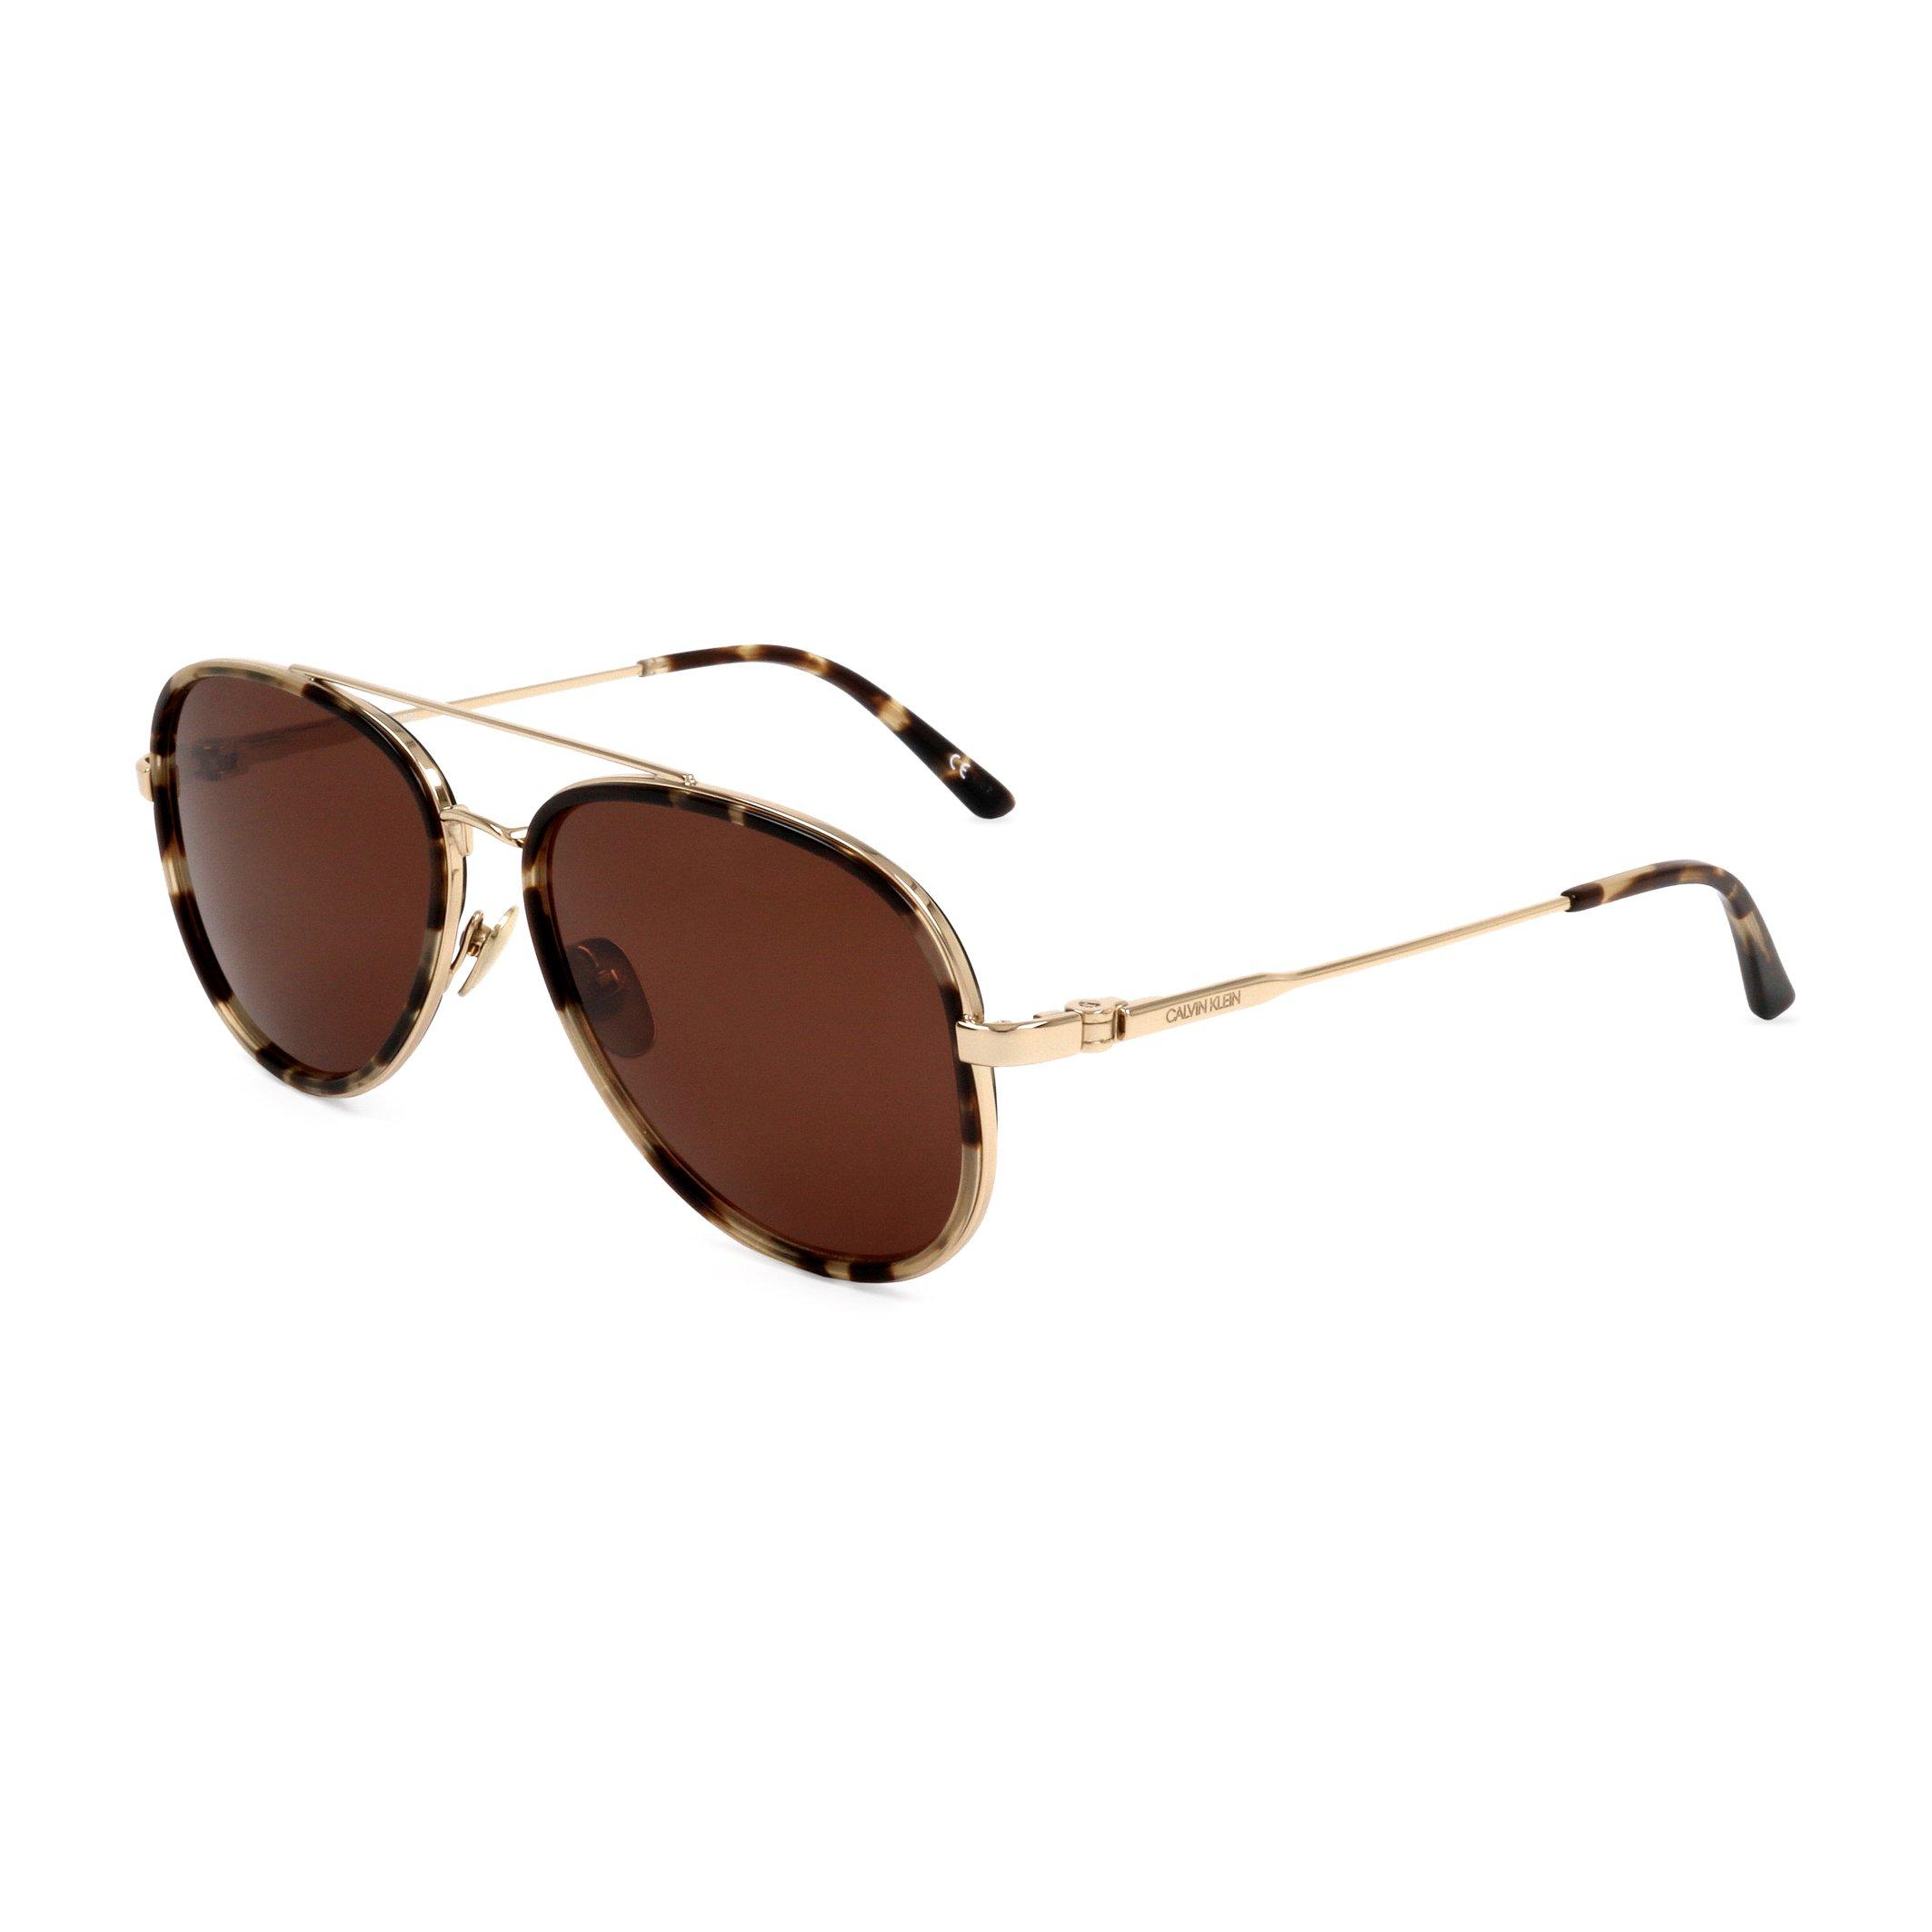 Calvin Klein Unisex Sunglasses White CK18103S - brown NOSIZE